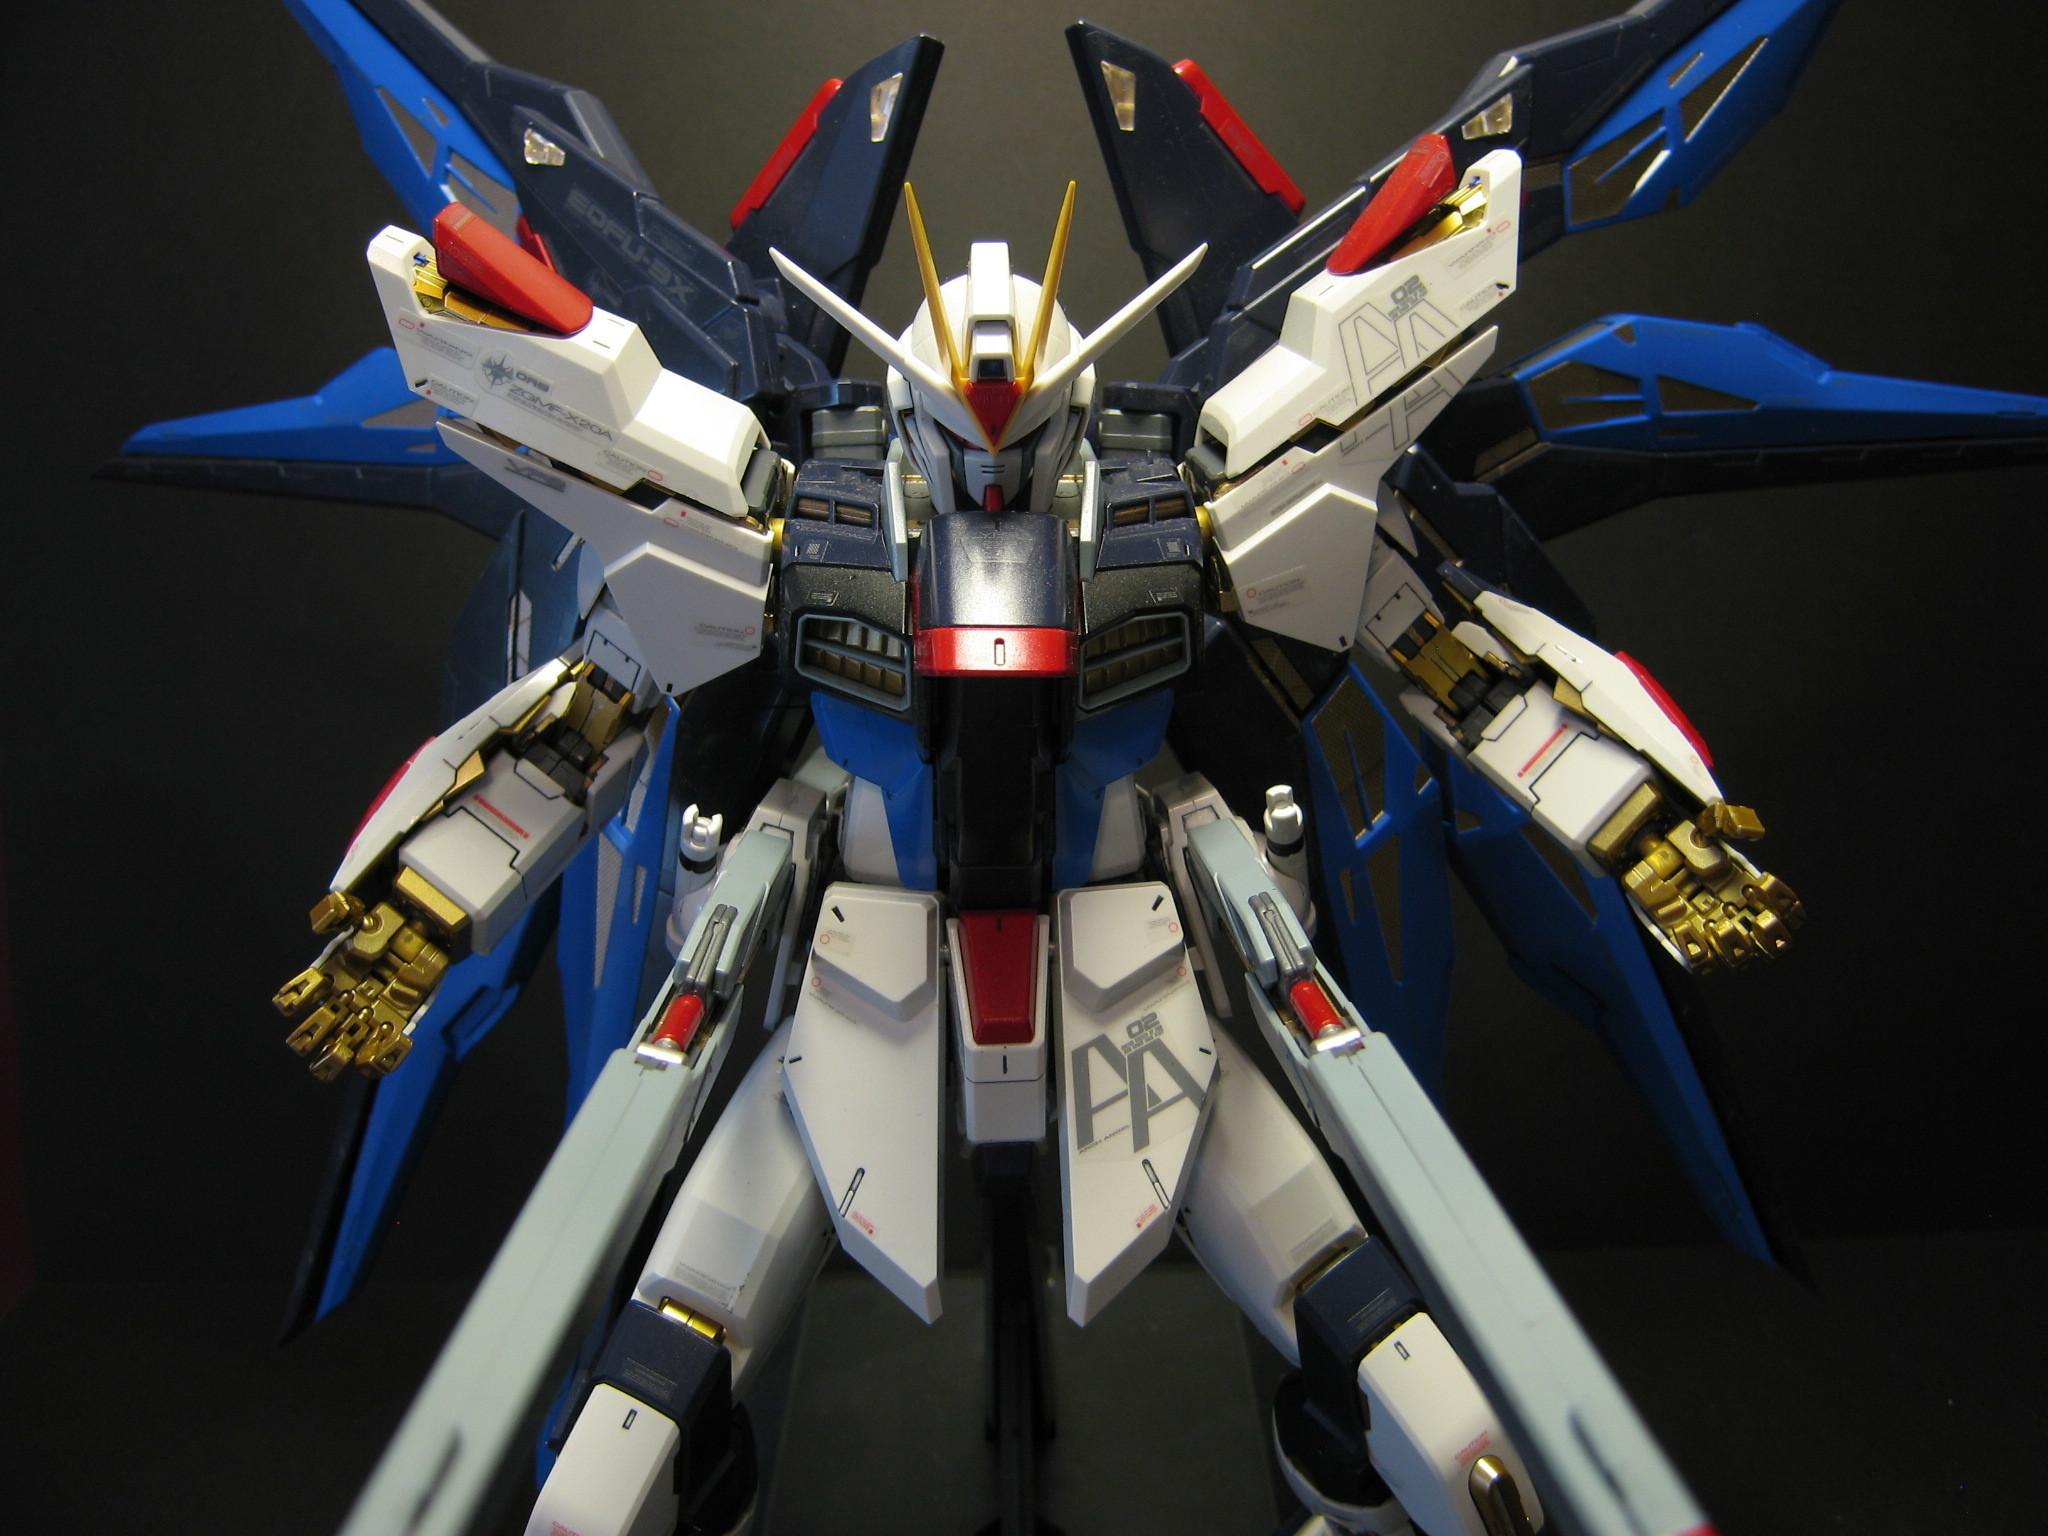 Gundam Strikedom Wallpaper Hd 93 Images